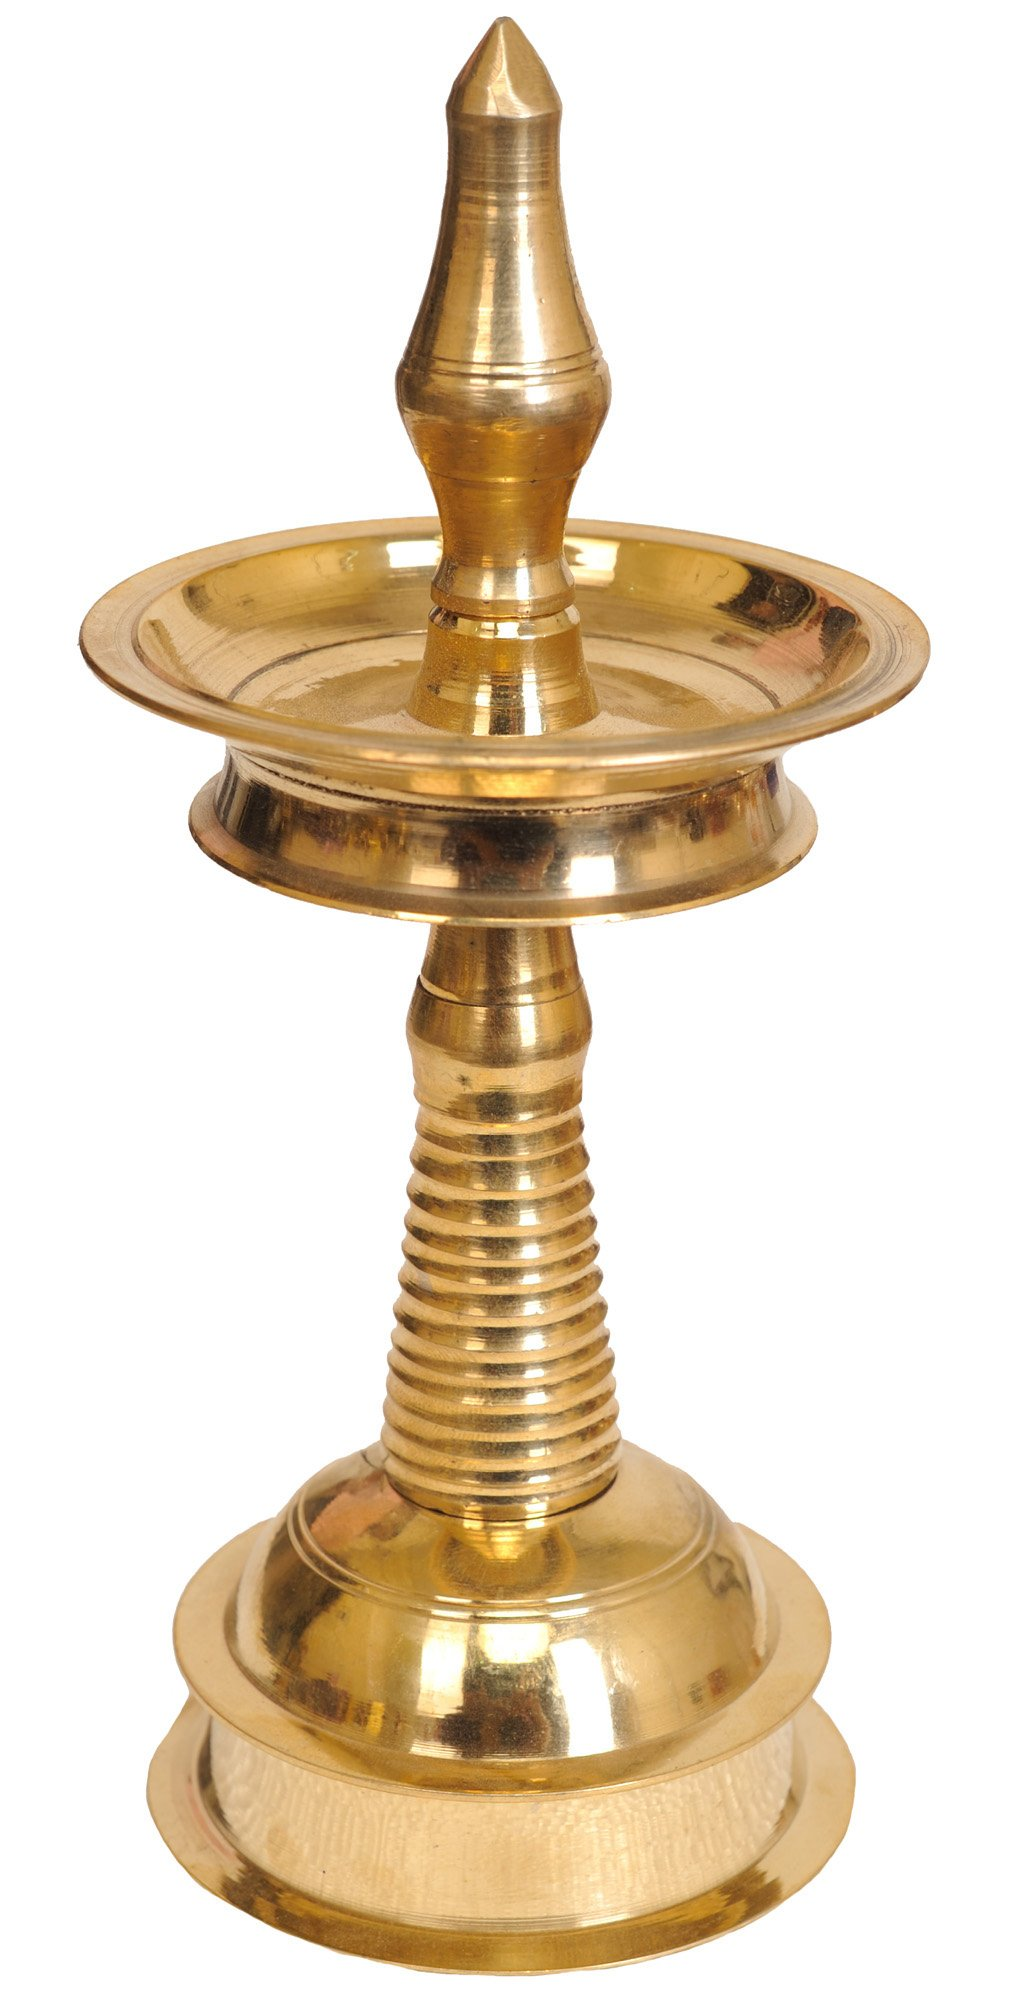 Puja Lamp from Kerala - Bronze